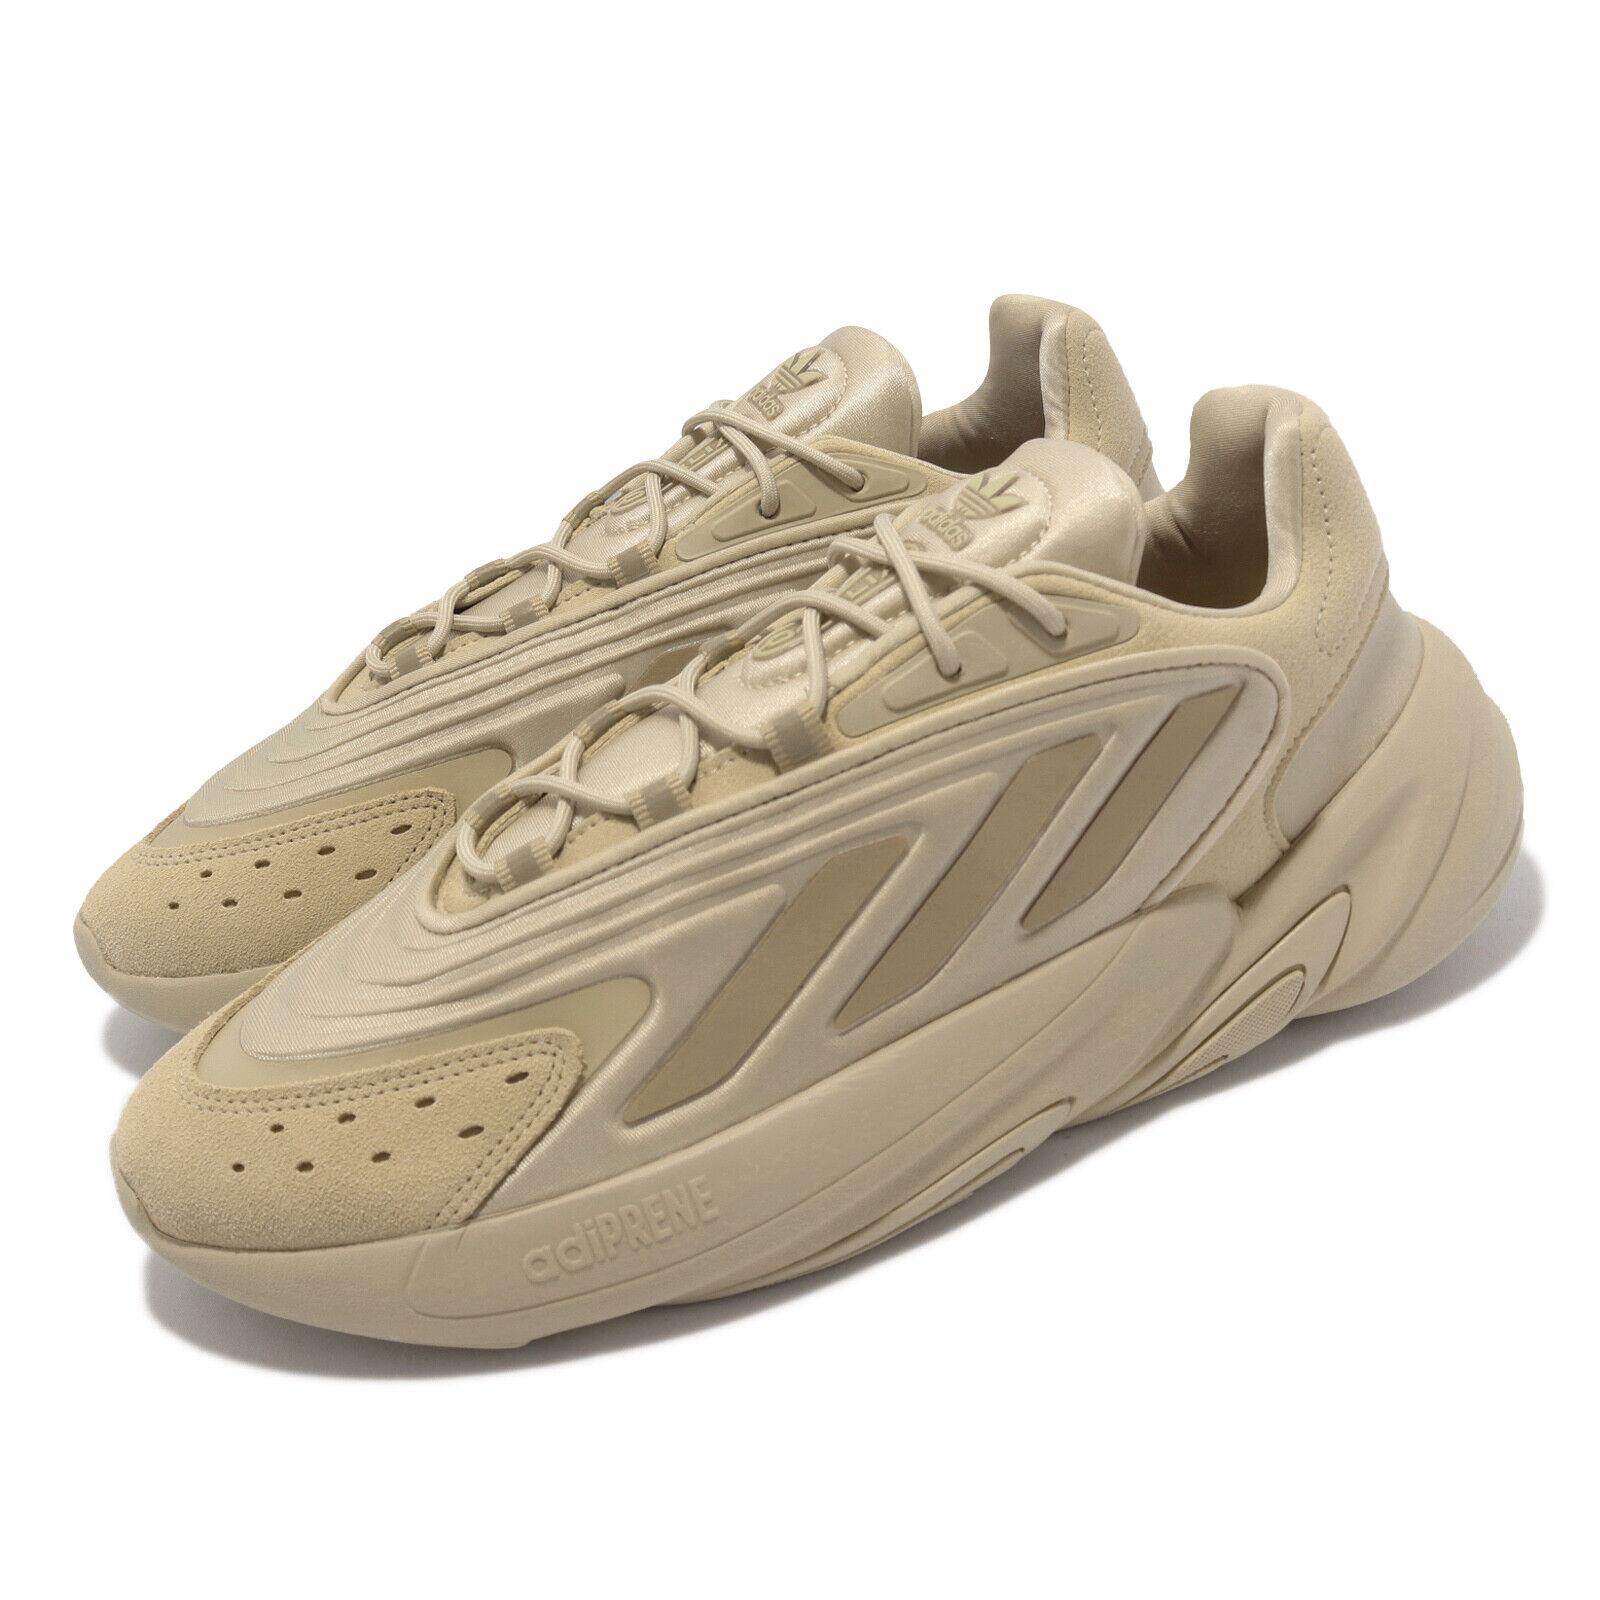 adidas Originals Ozelia Brown Khaki Men Unisex Casual Lifestyle Shoes GV7685